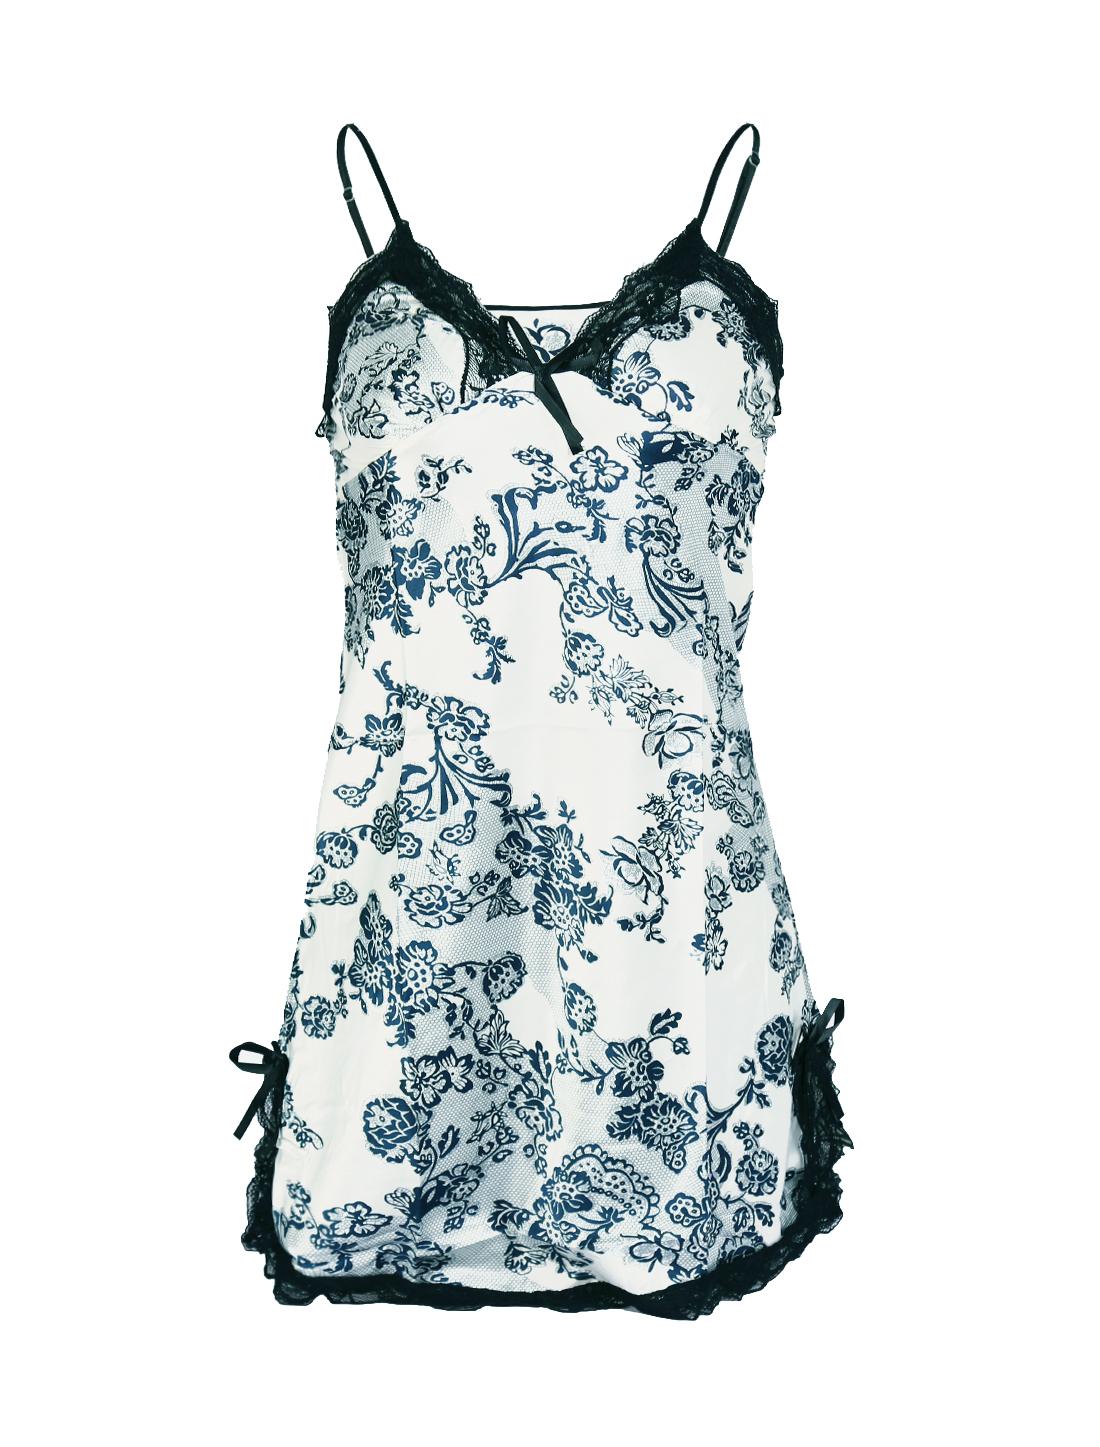 Women Satin Lace Trim Sleepwear Nightgown Pajama Slip Dress Floral-Lace XXL